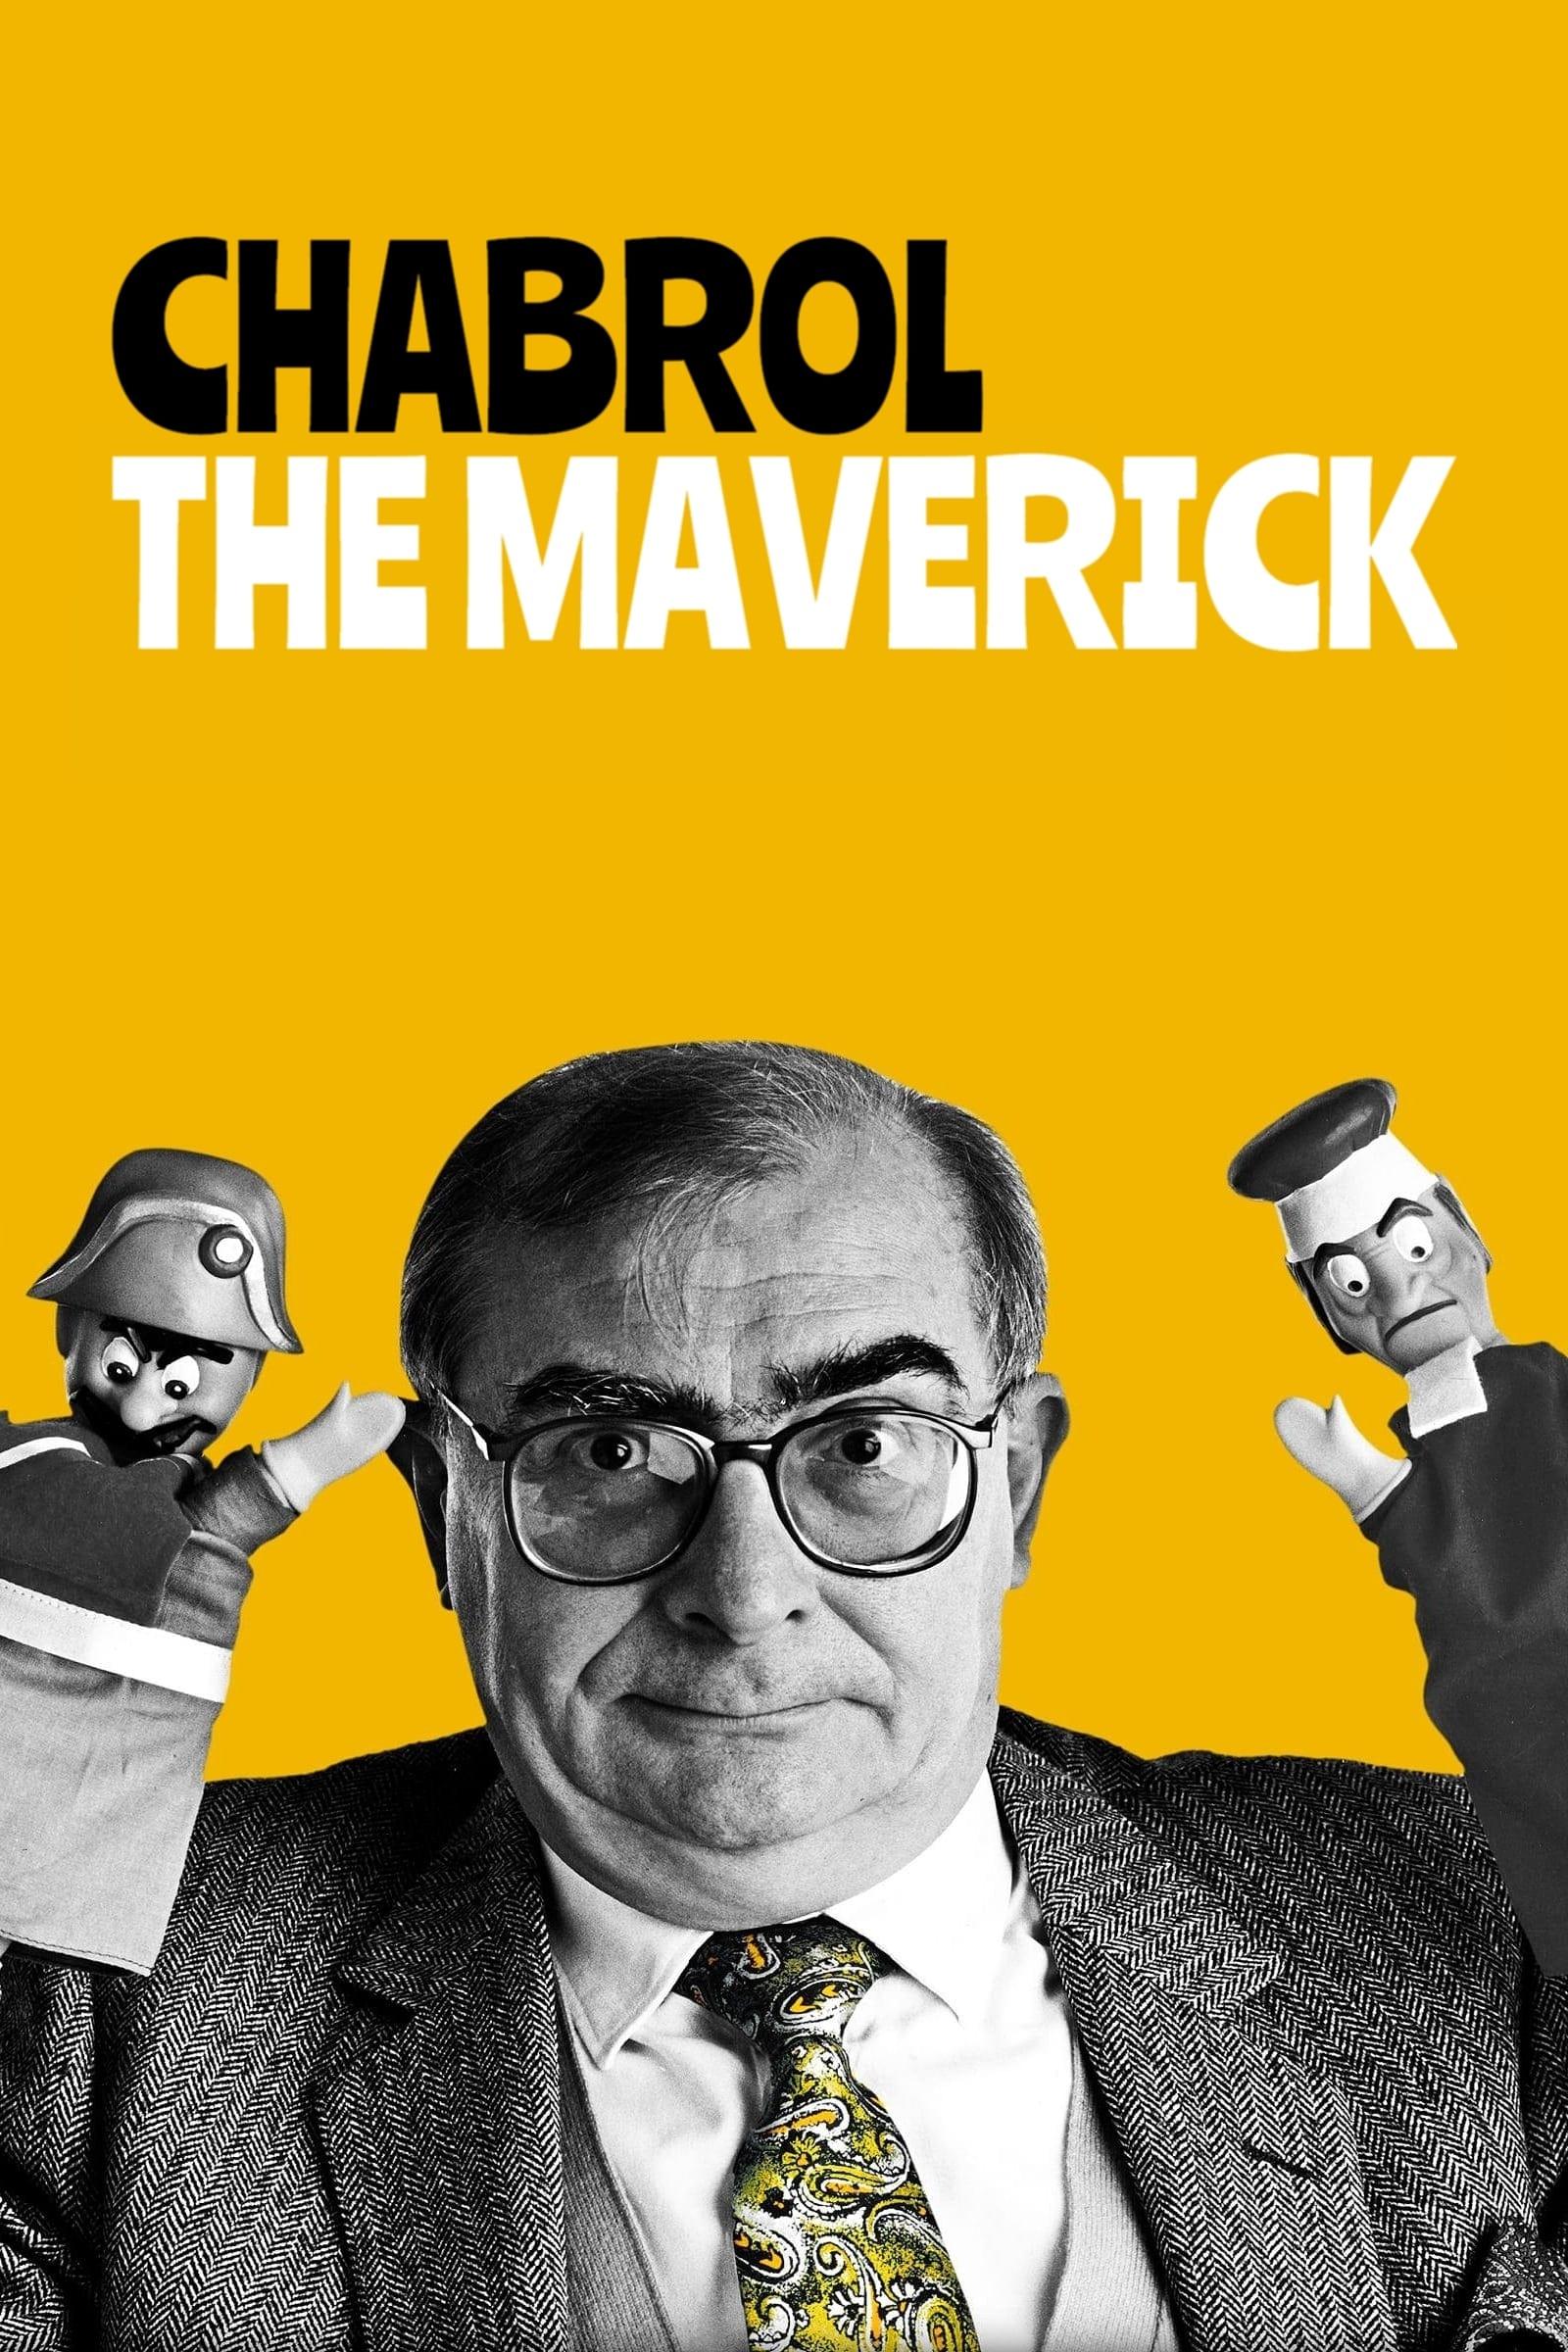 Claude Chabrol, the Maverick